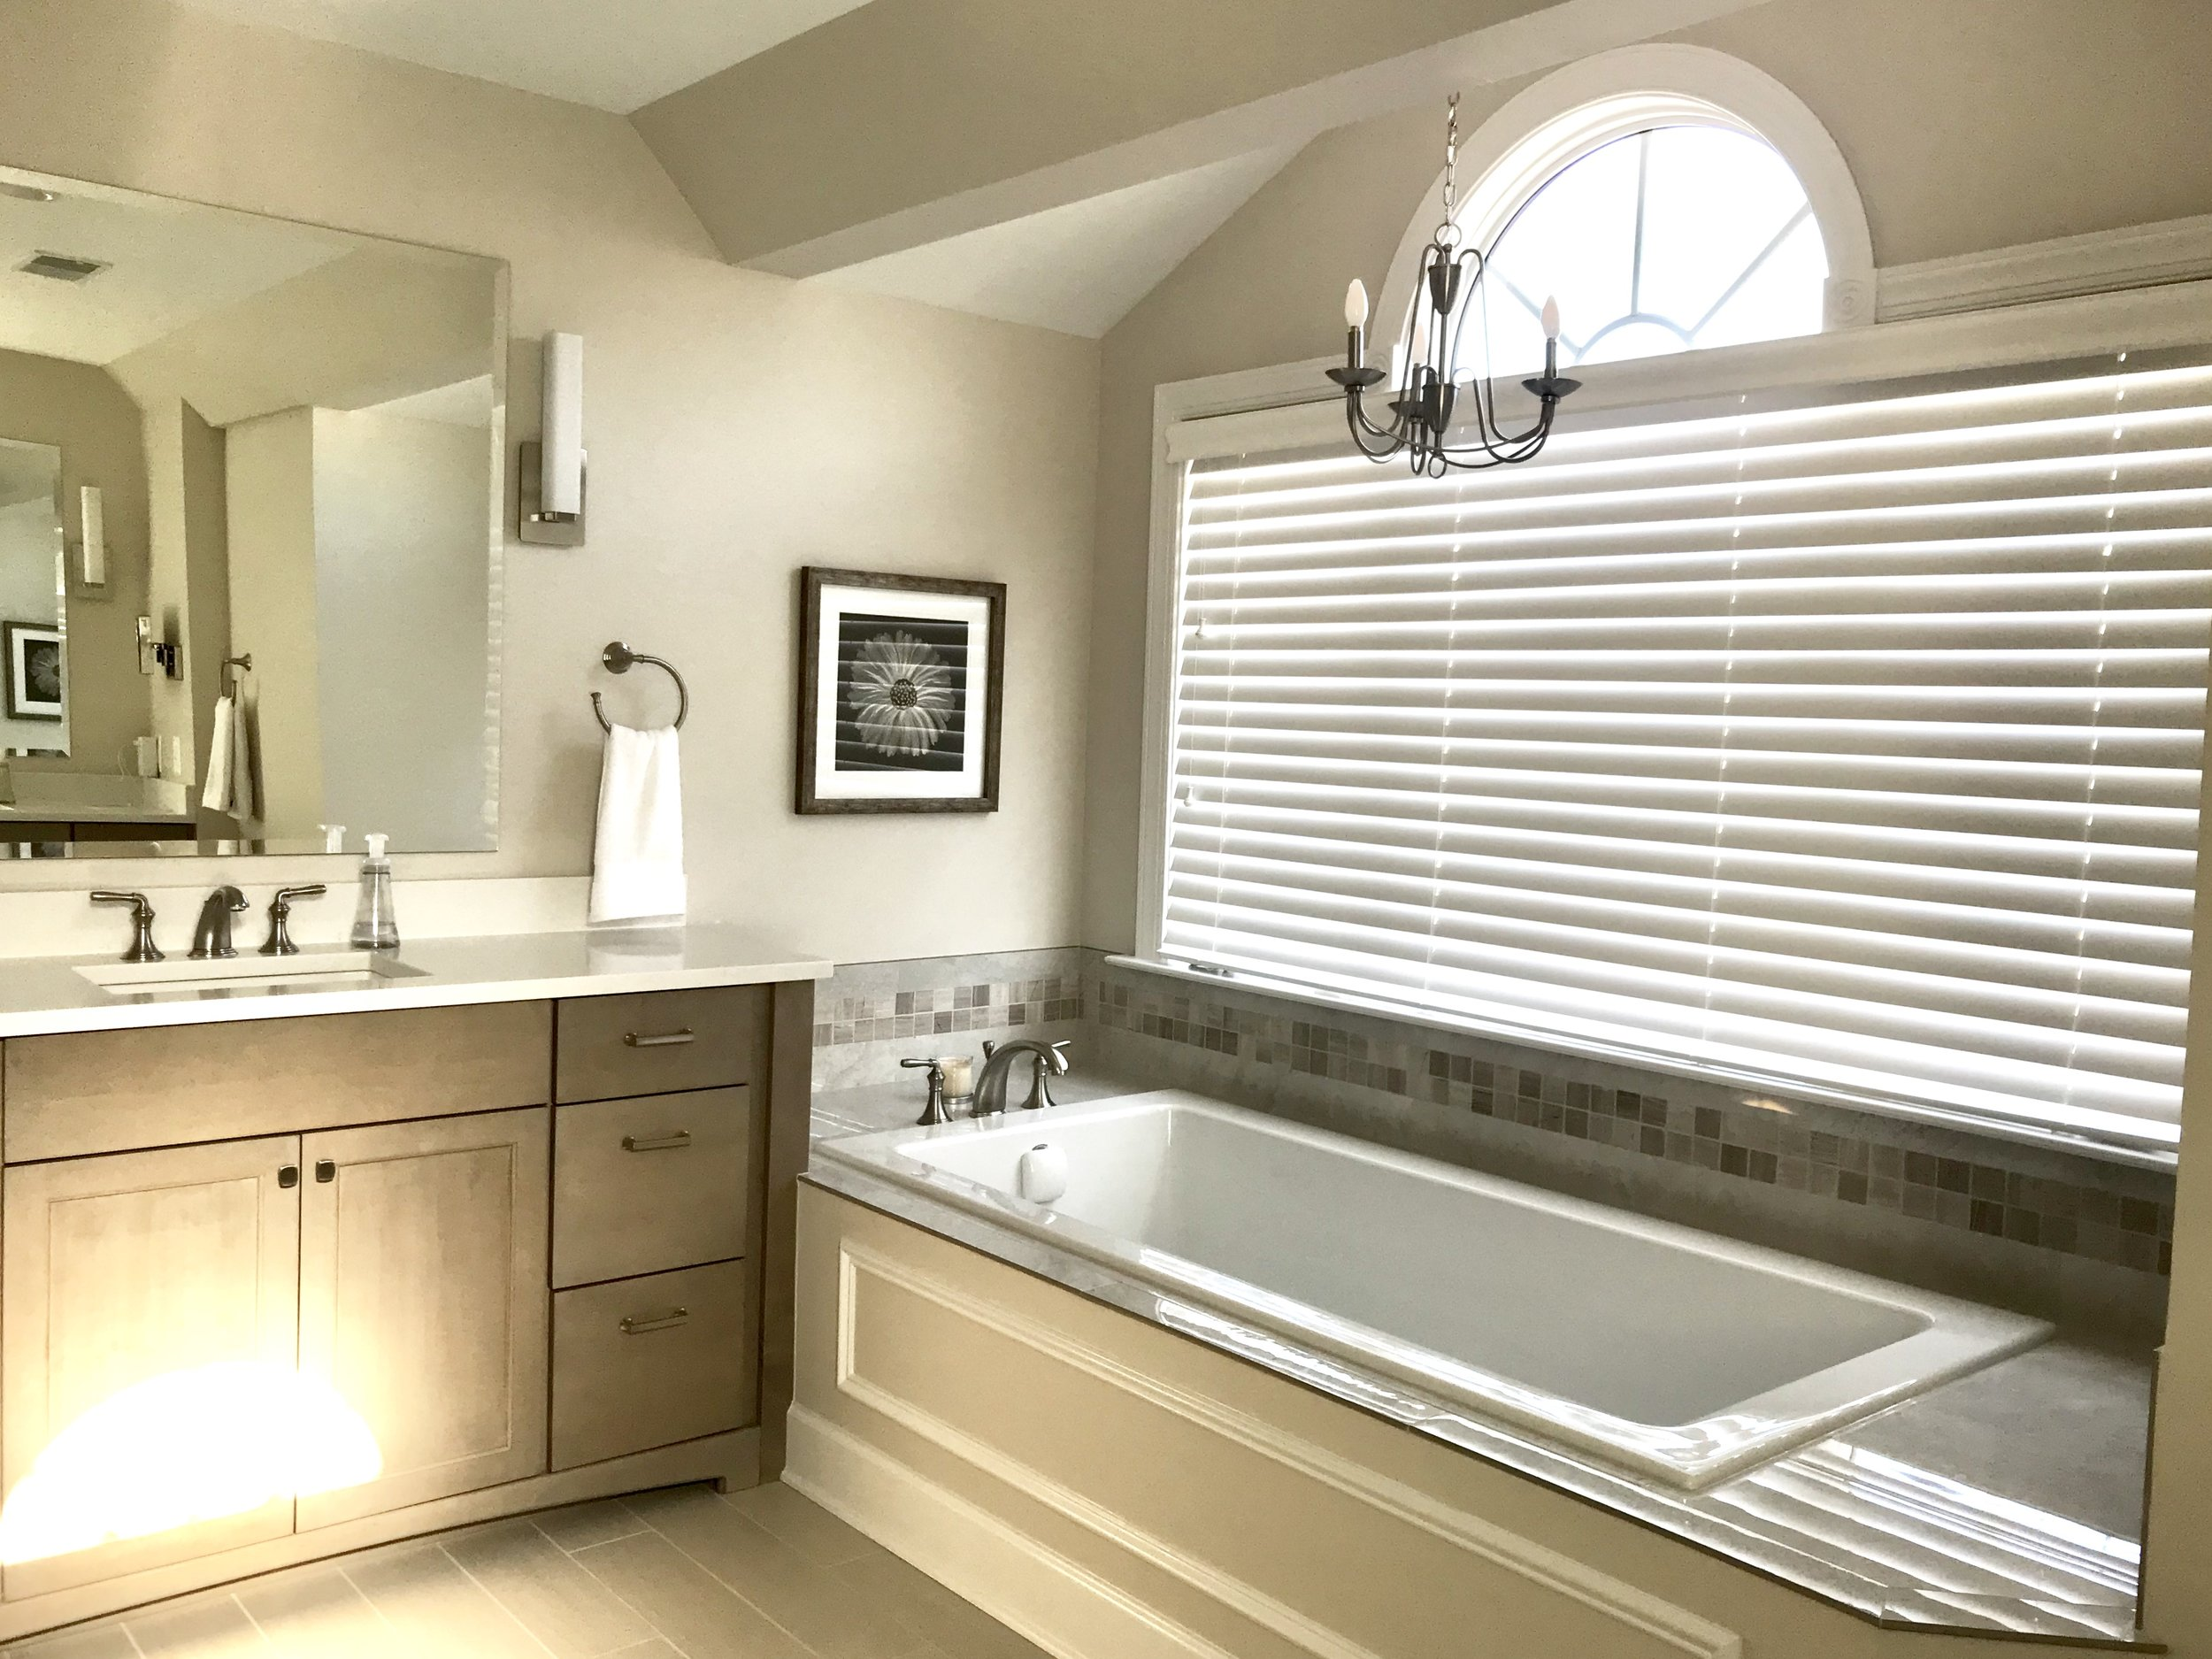 Bell_Bathroom_After_1.jpg